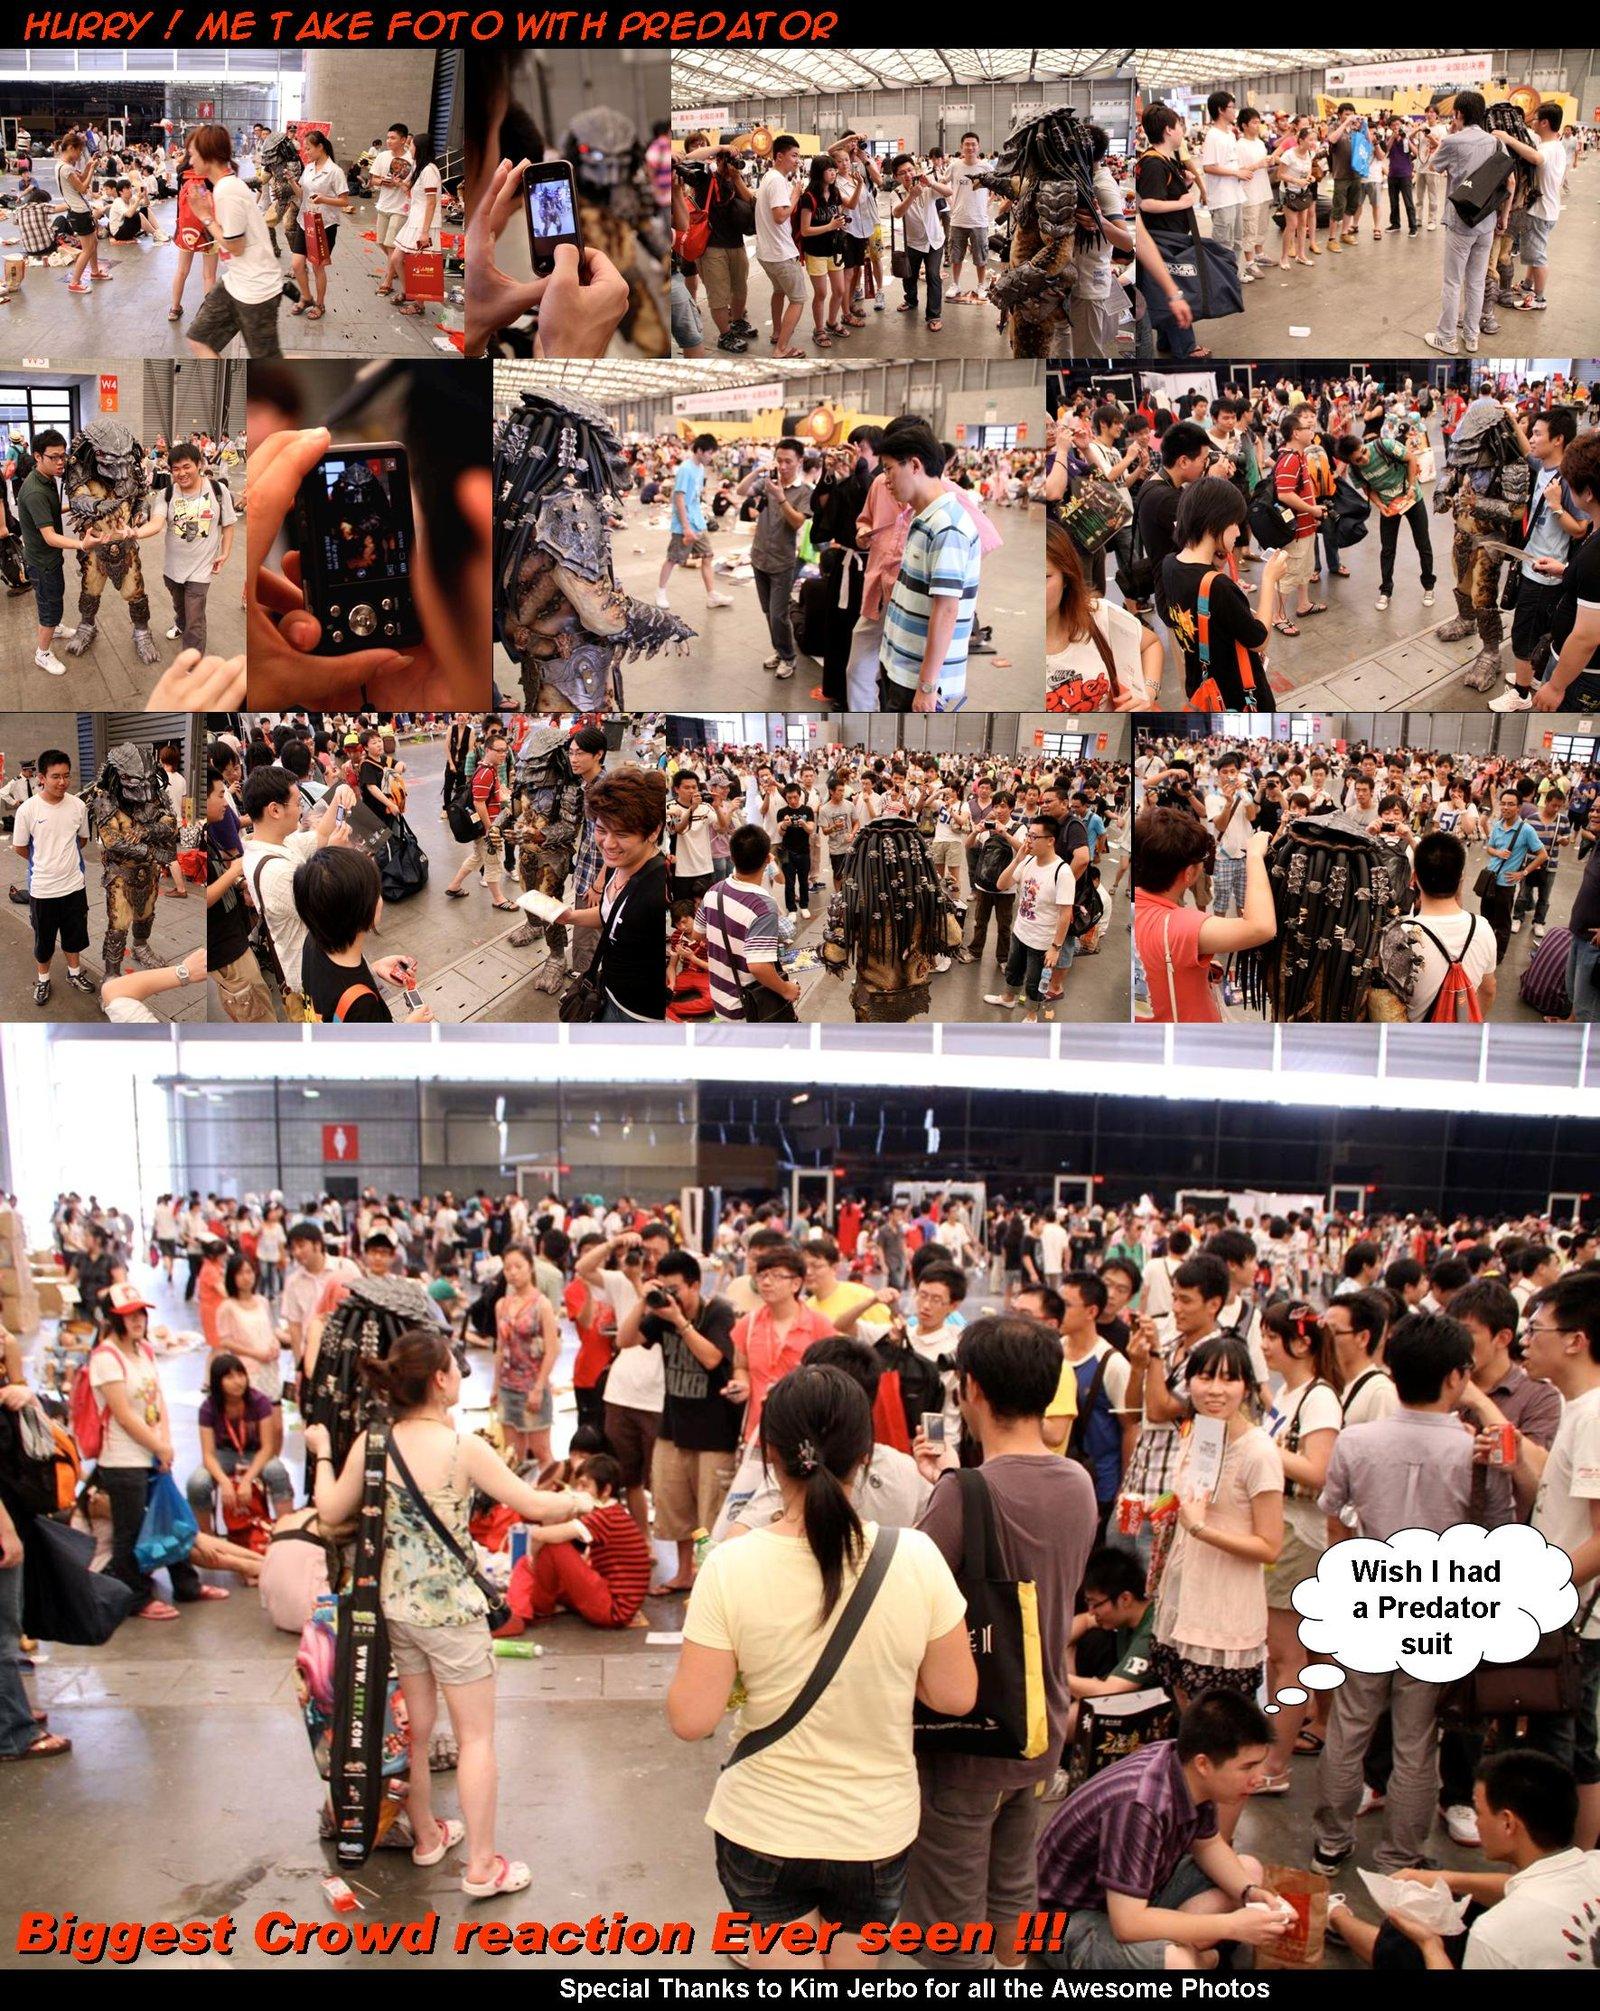 ChinaJoy_Crowd_for_Predator_by_MichaelLoh.jpg